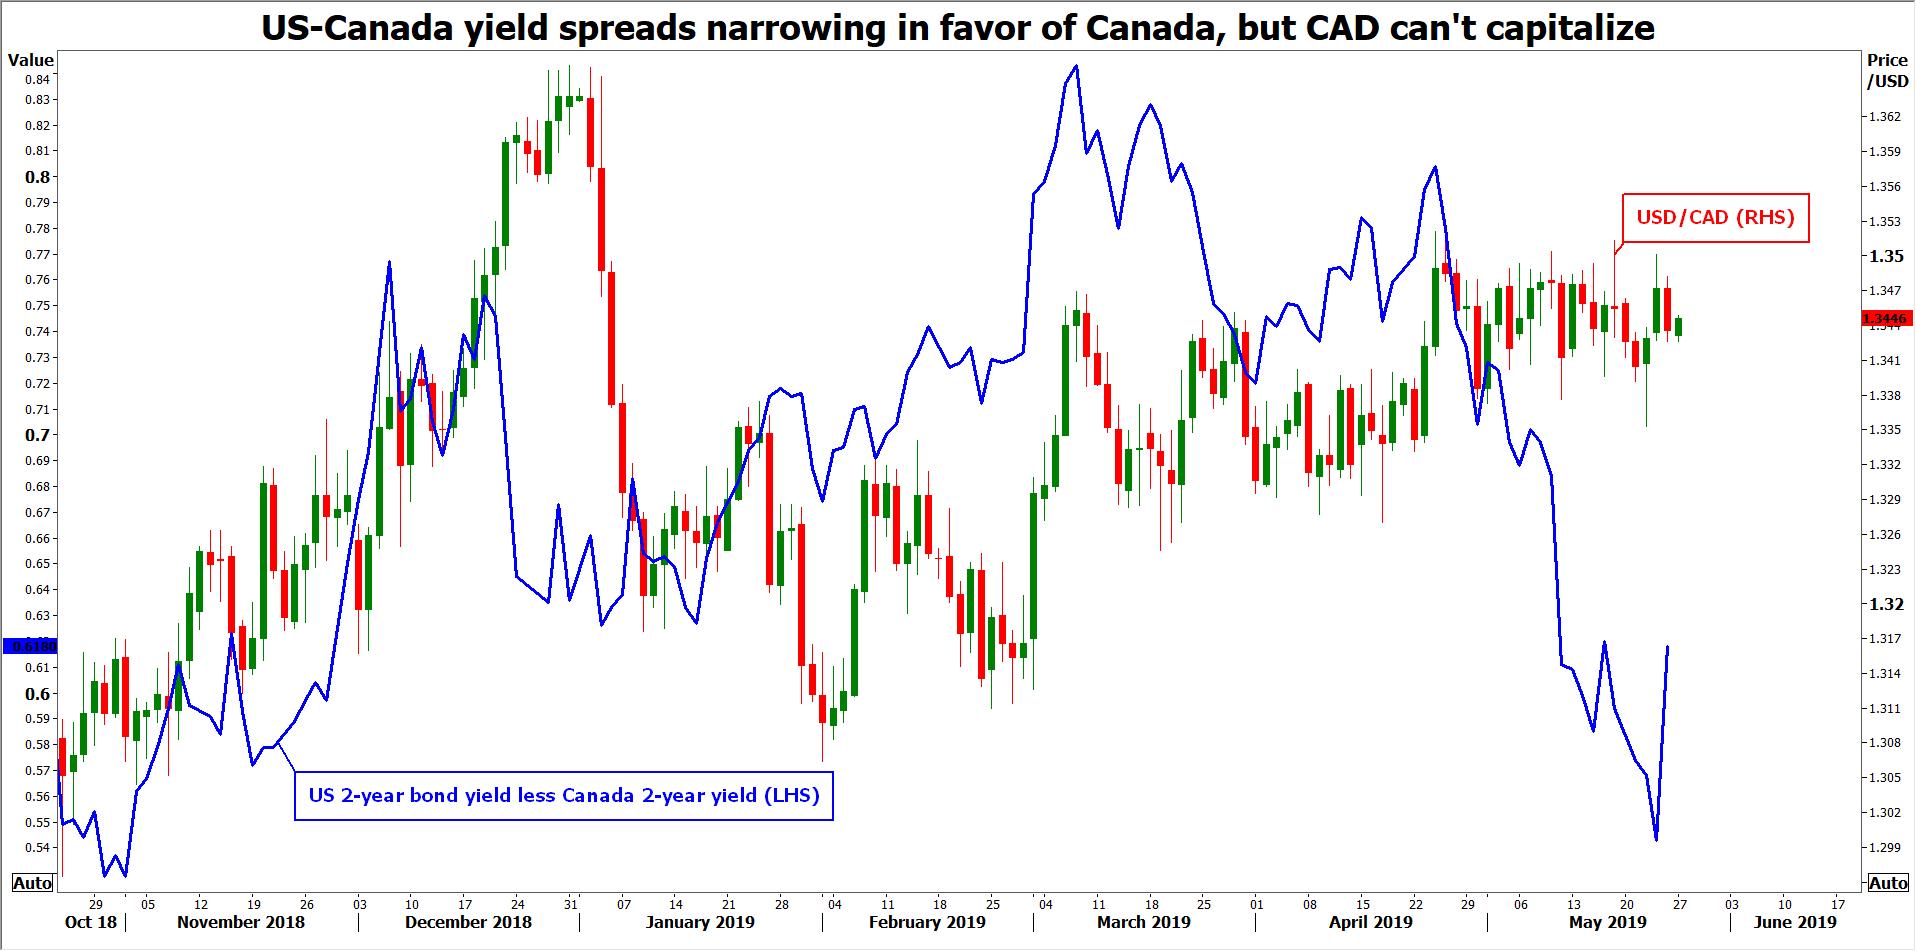 USDCAD vs yields